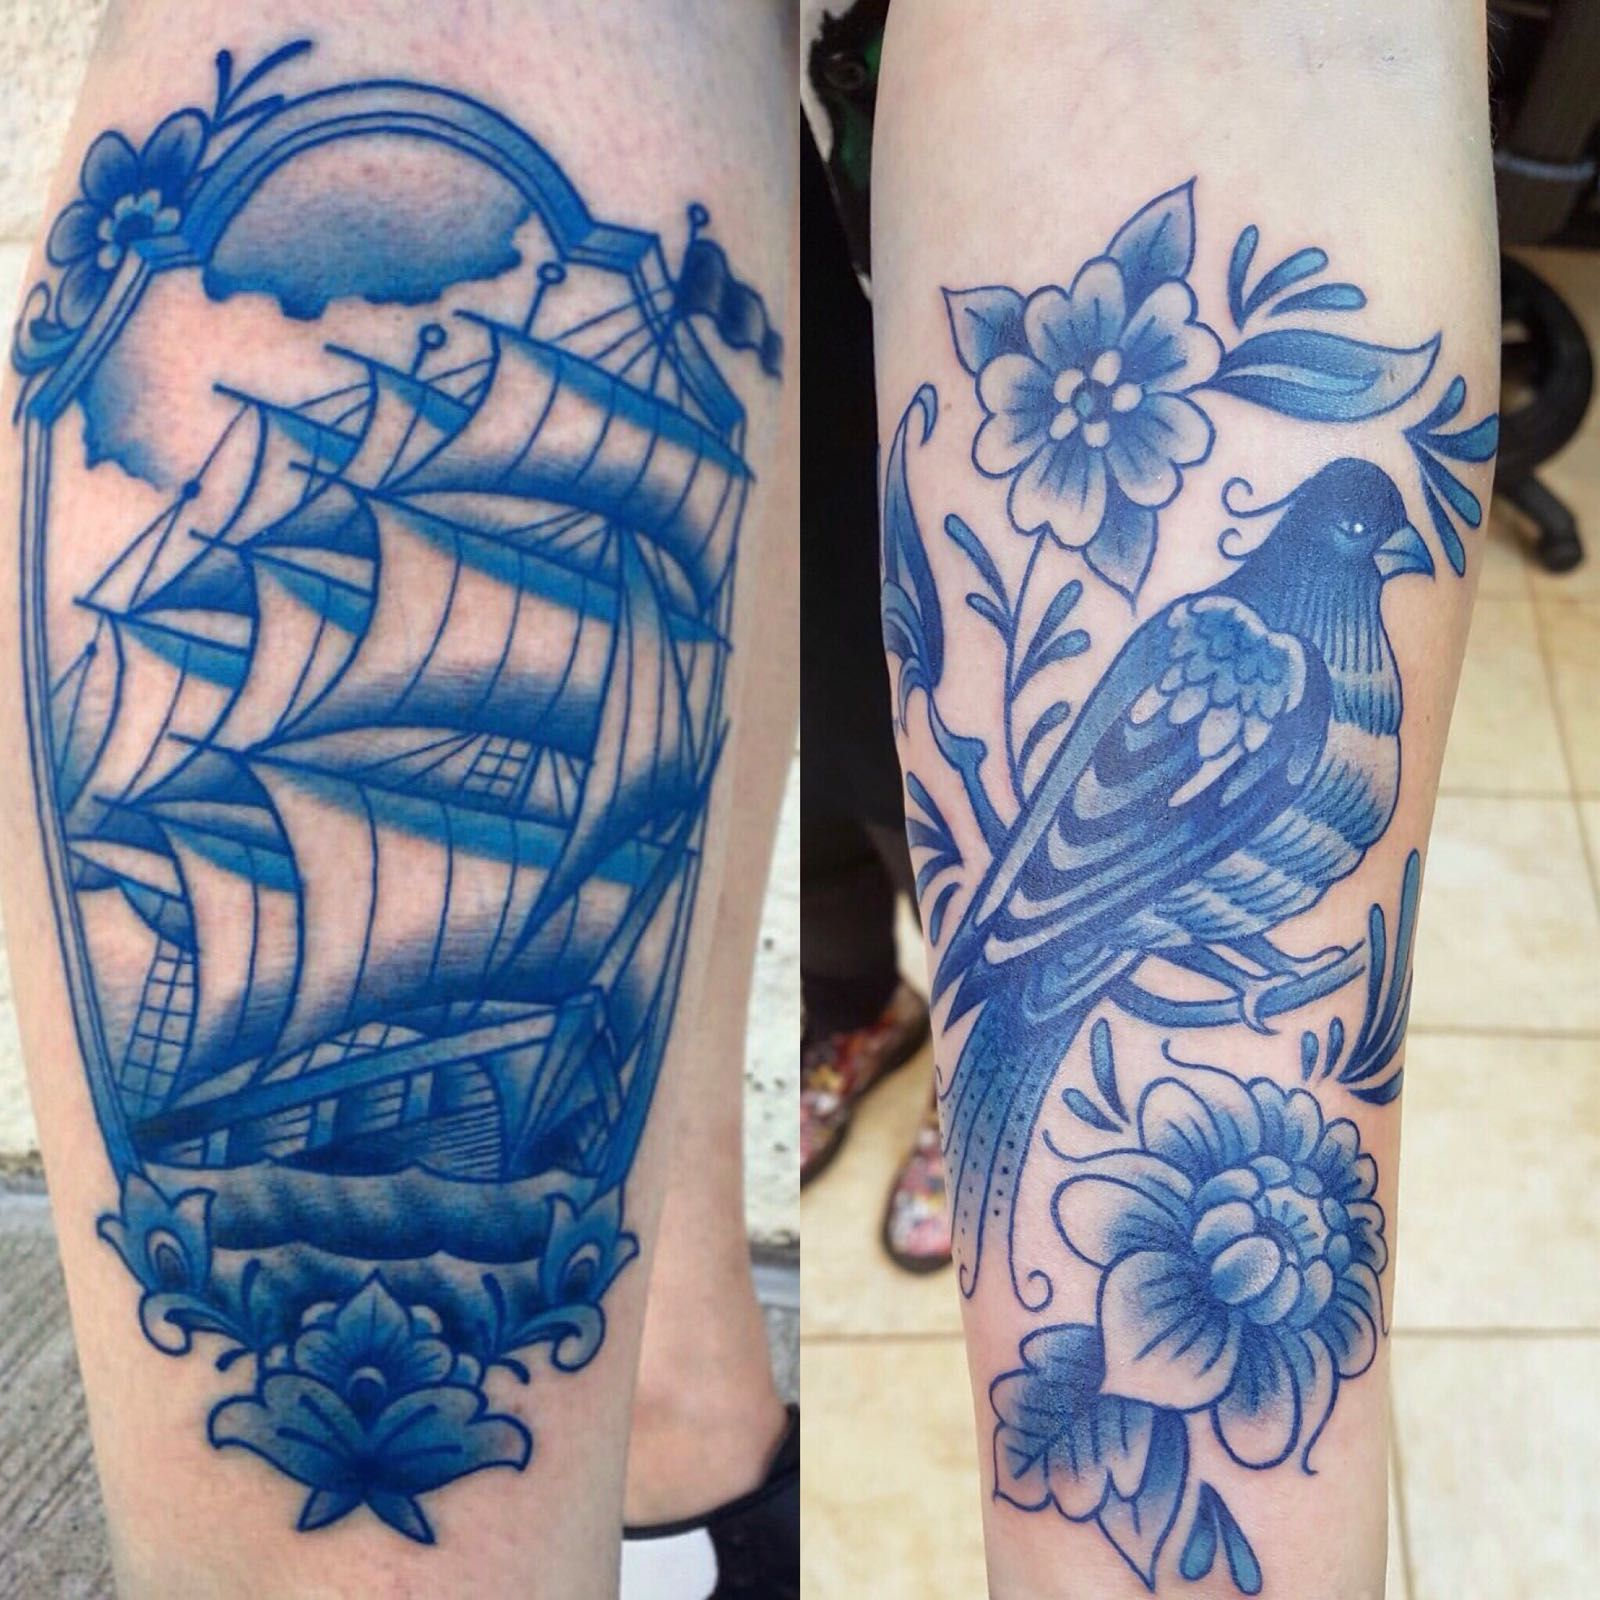 My First And Second Delft Blue Tattoos By Jon Squires Urge 2 Tattoo Edmonton Alberta Blue Tattoo Blue Ink Tattoos Tattoos